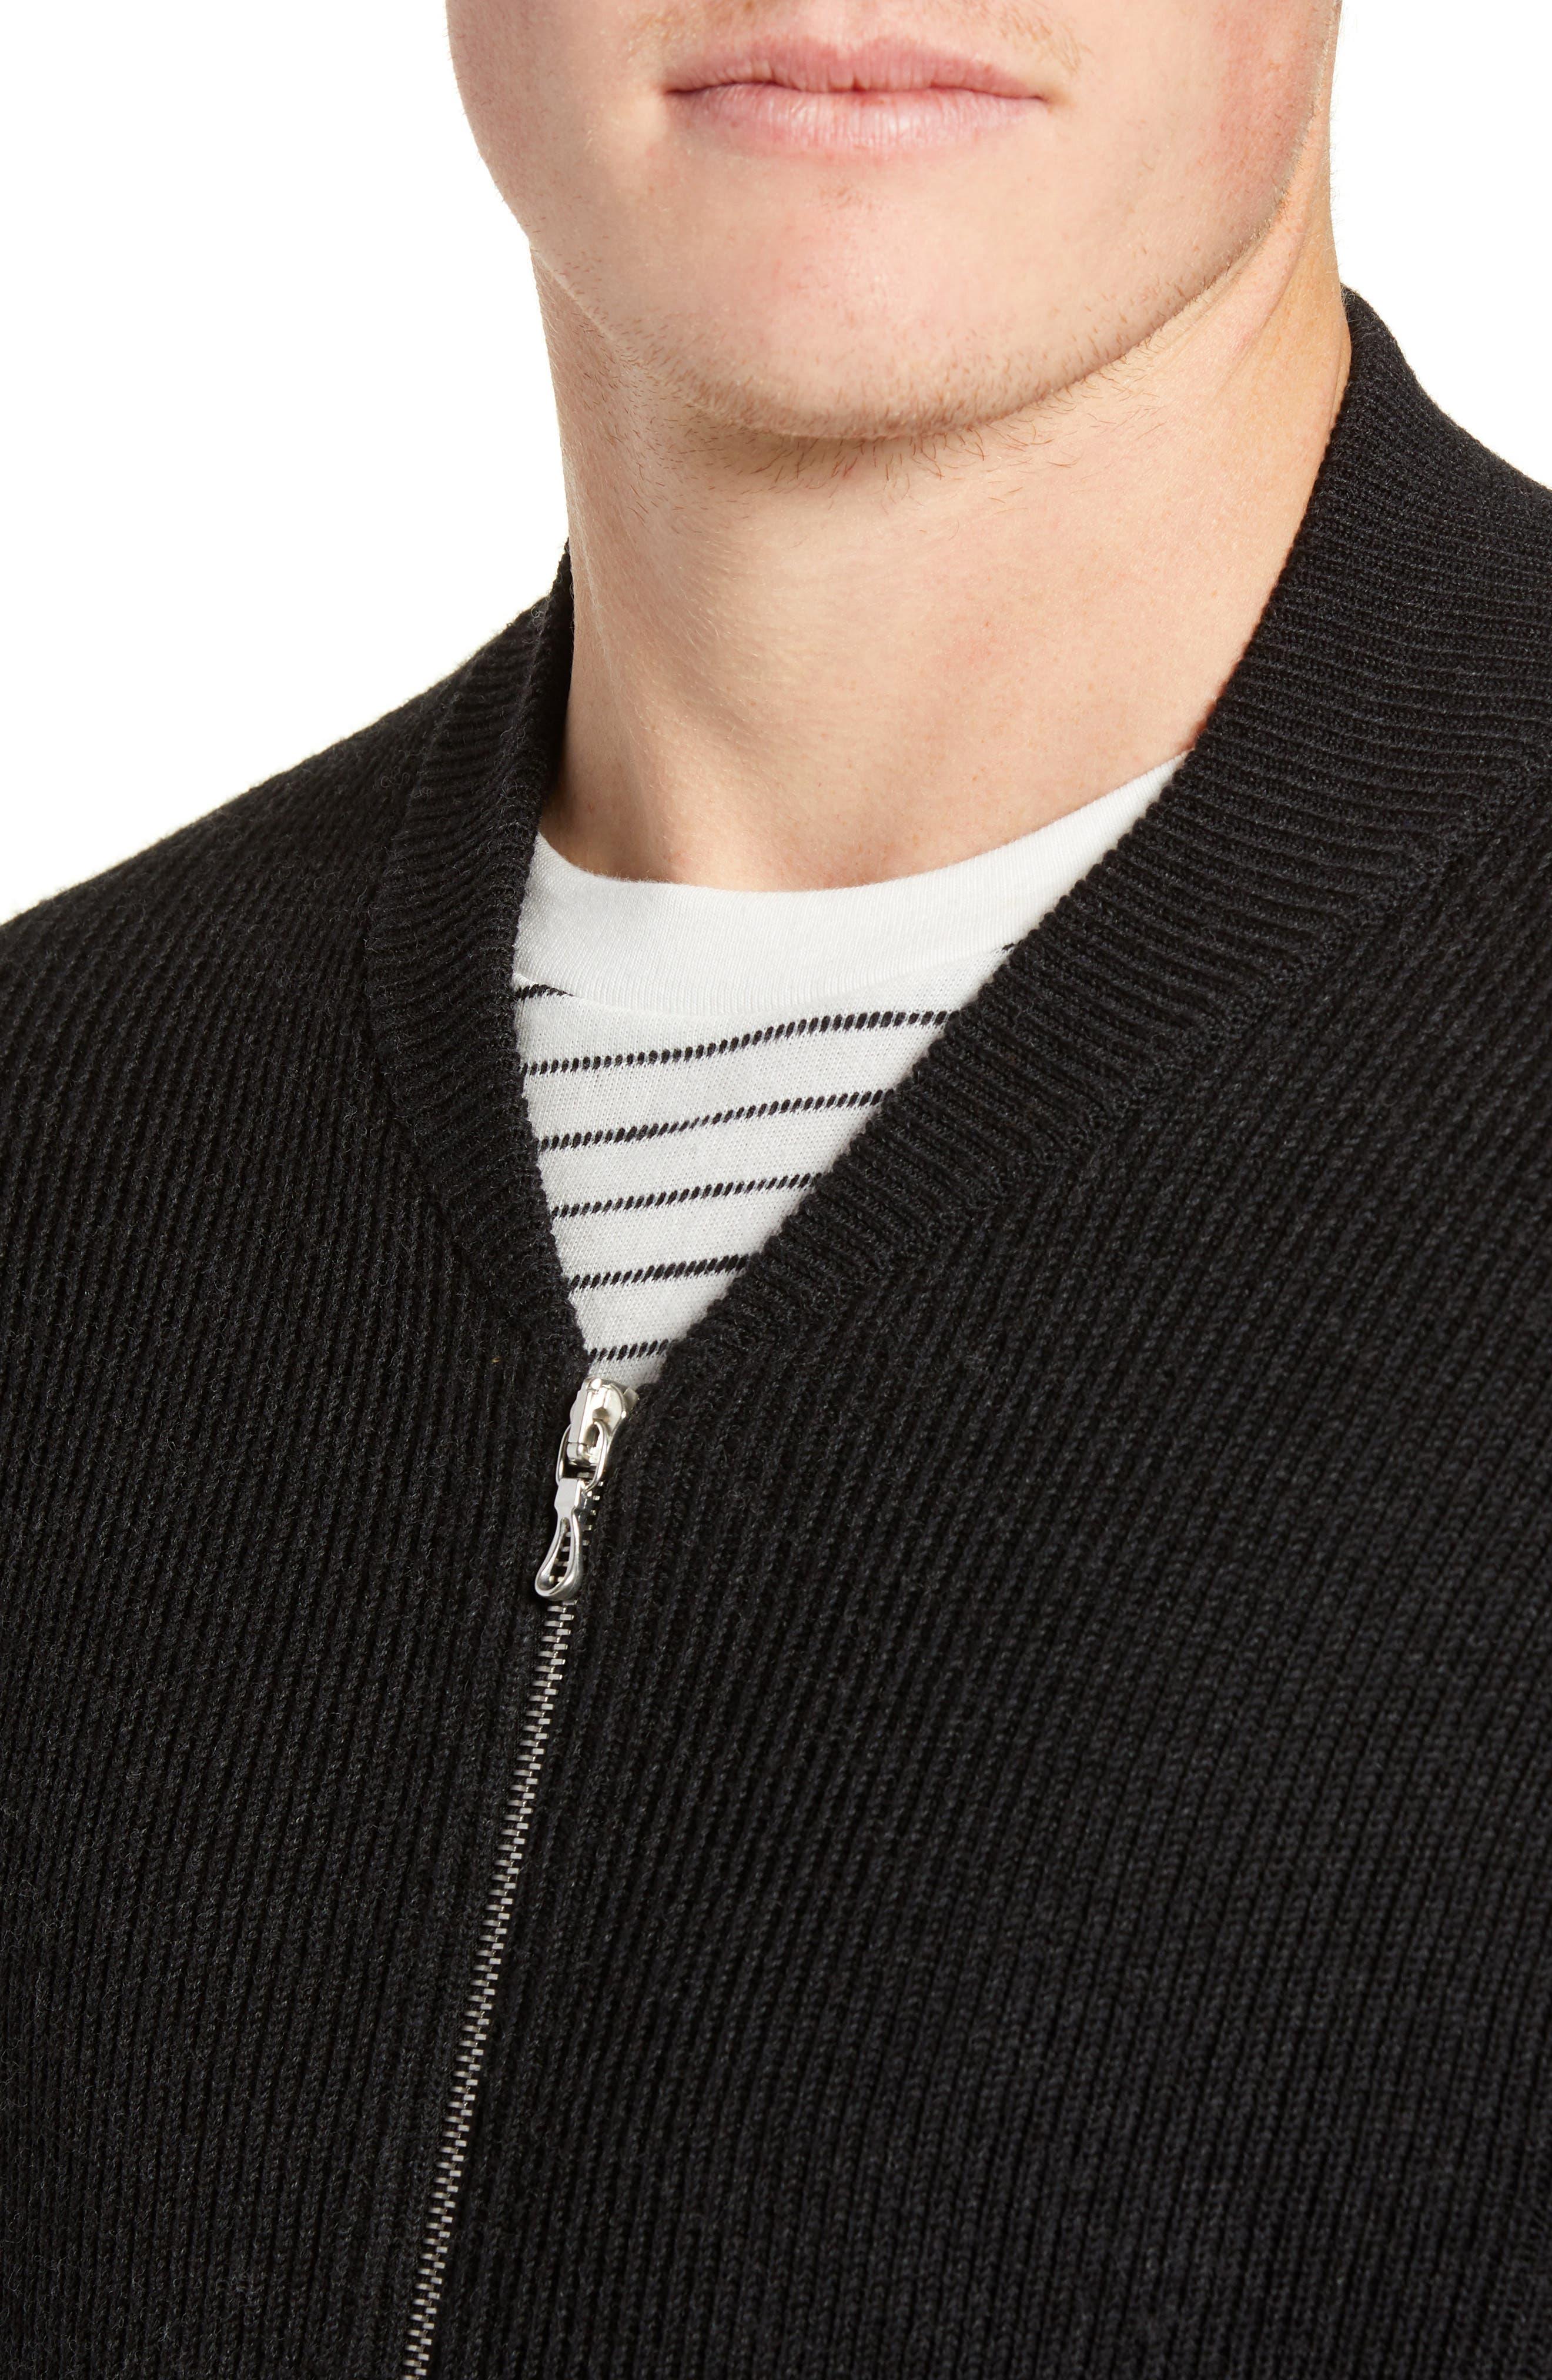 RAG & BONE, Andrew Zip Front Merino Wool Sweater, Alternate thumbnail 4, color, BLACK HEATHER